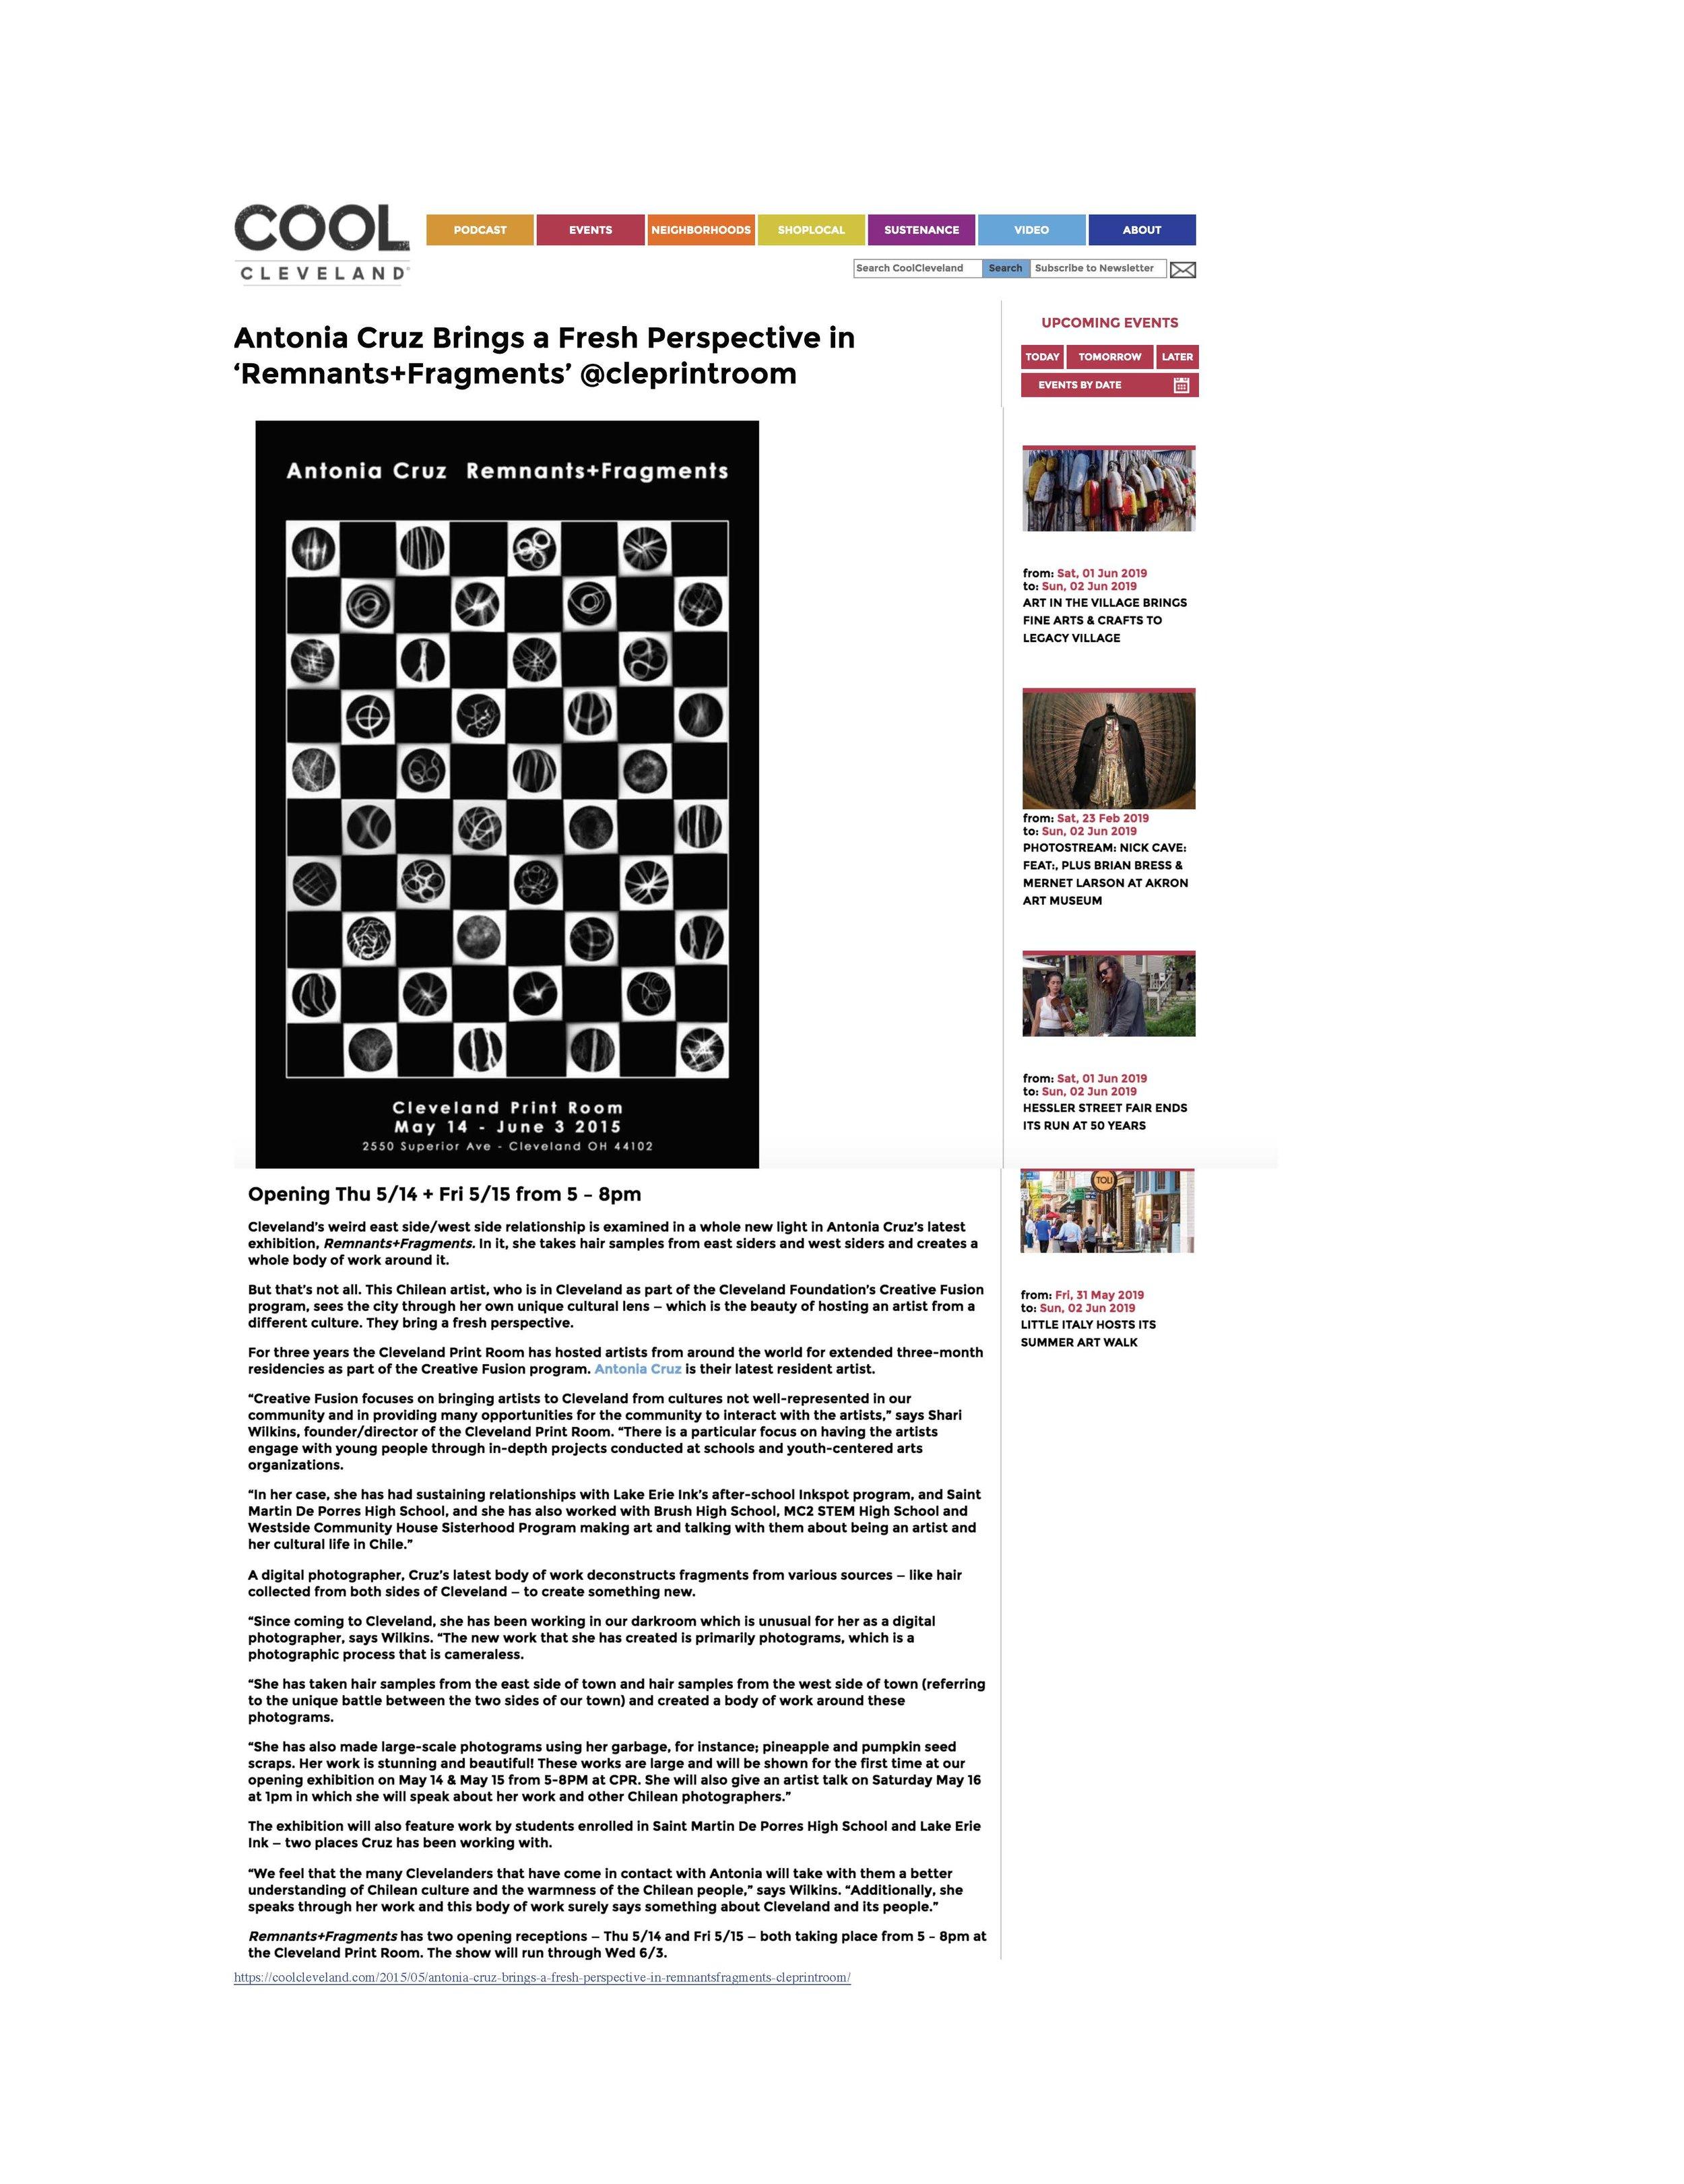 Exposición Remandts and Fragments, Cool Cleveland, Ohio, Estados Unidos, .pdf